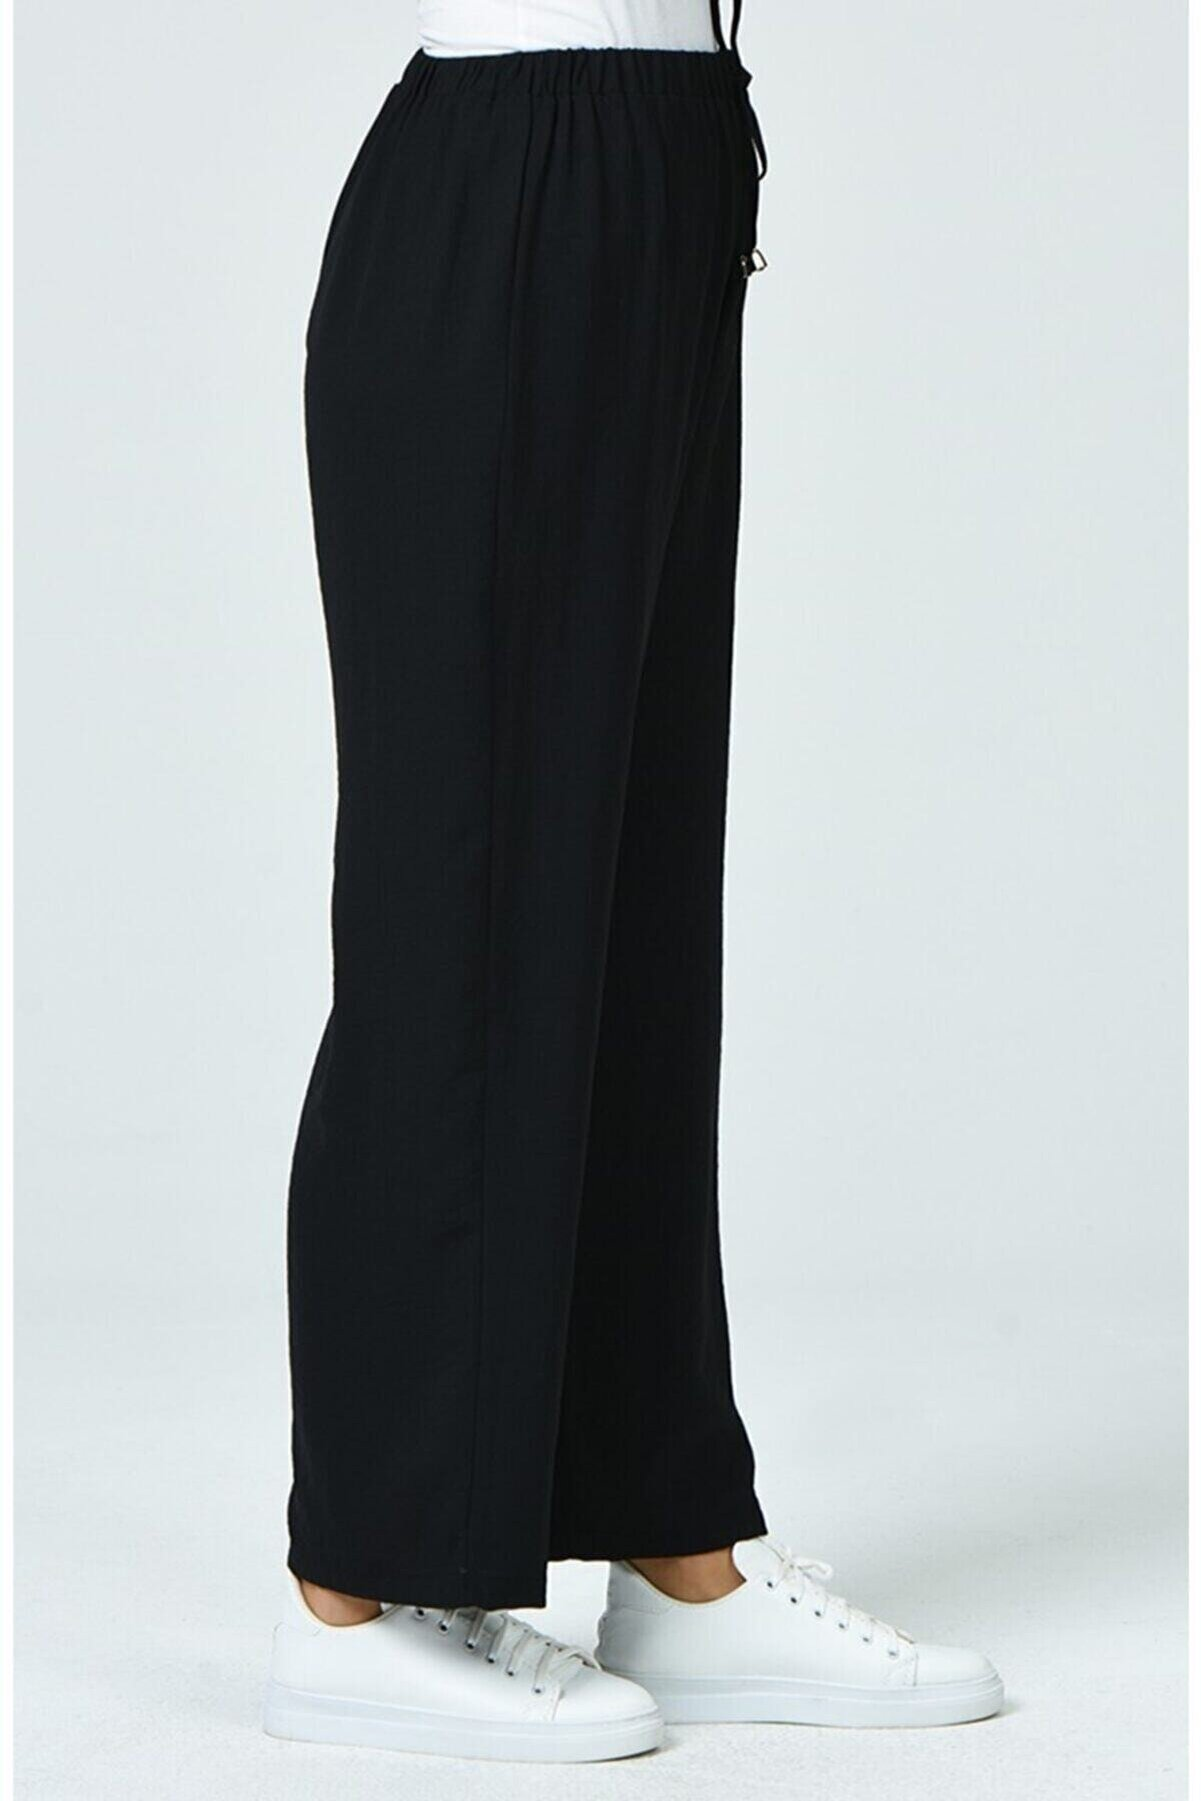 modayseli Airobin Beli Lastikli Pantolon